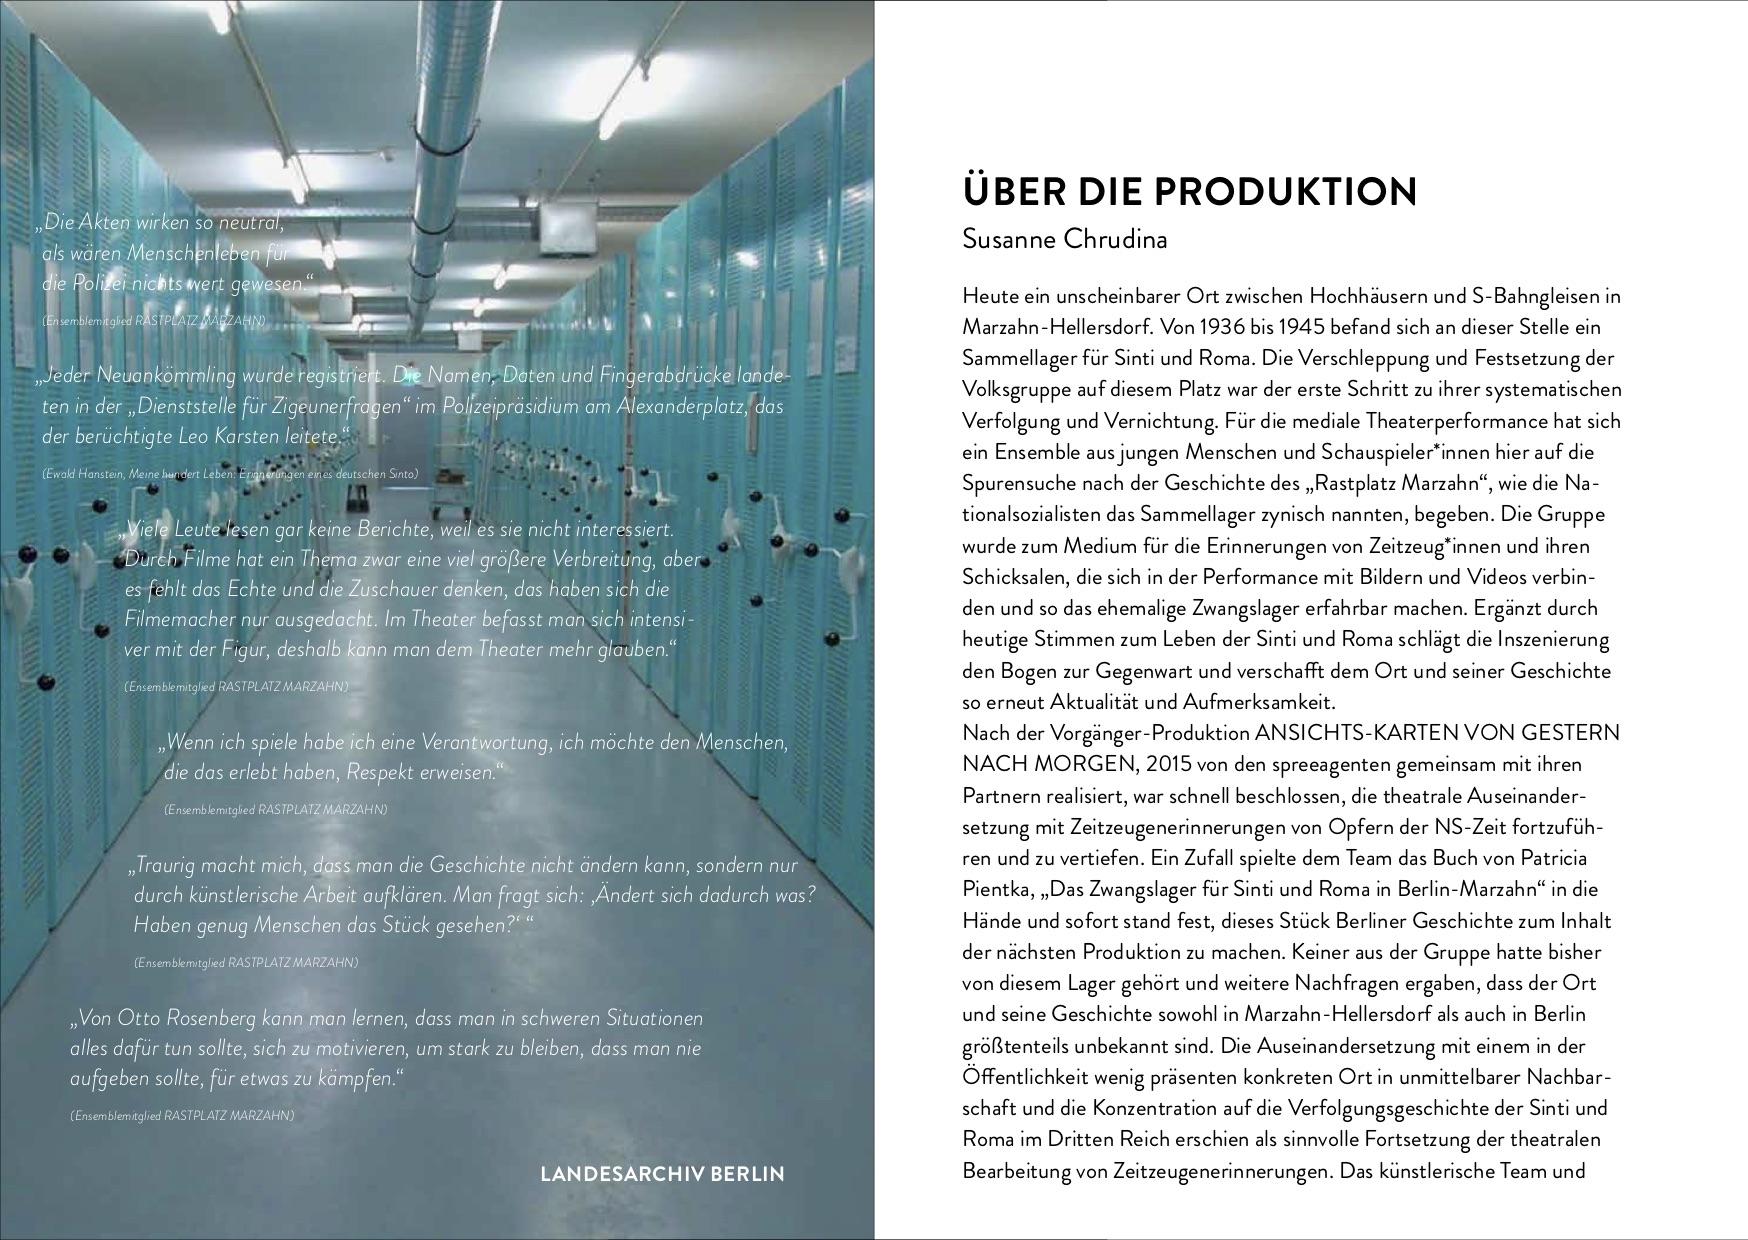 Doku-Broschüre_spreeagenten_RAM_Bro_28-Seiter_A5_03_15.12.17_S20+21.jpg